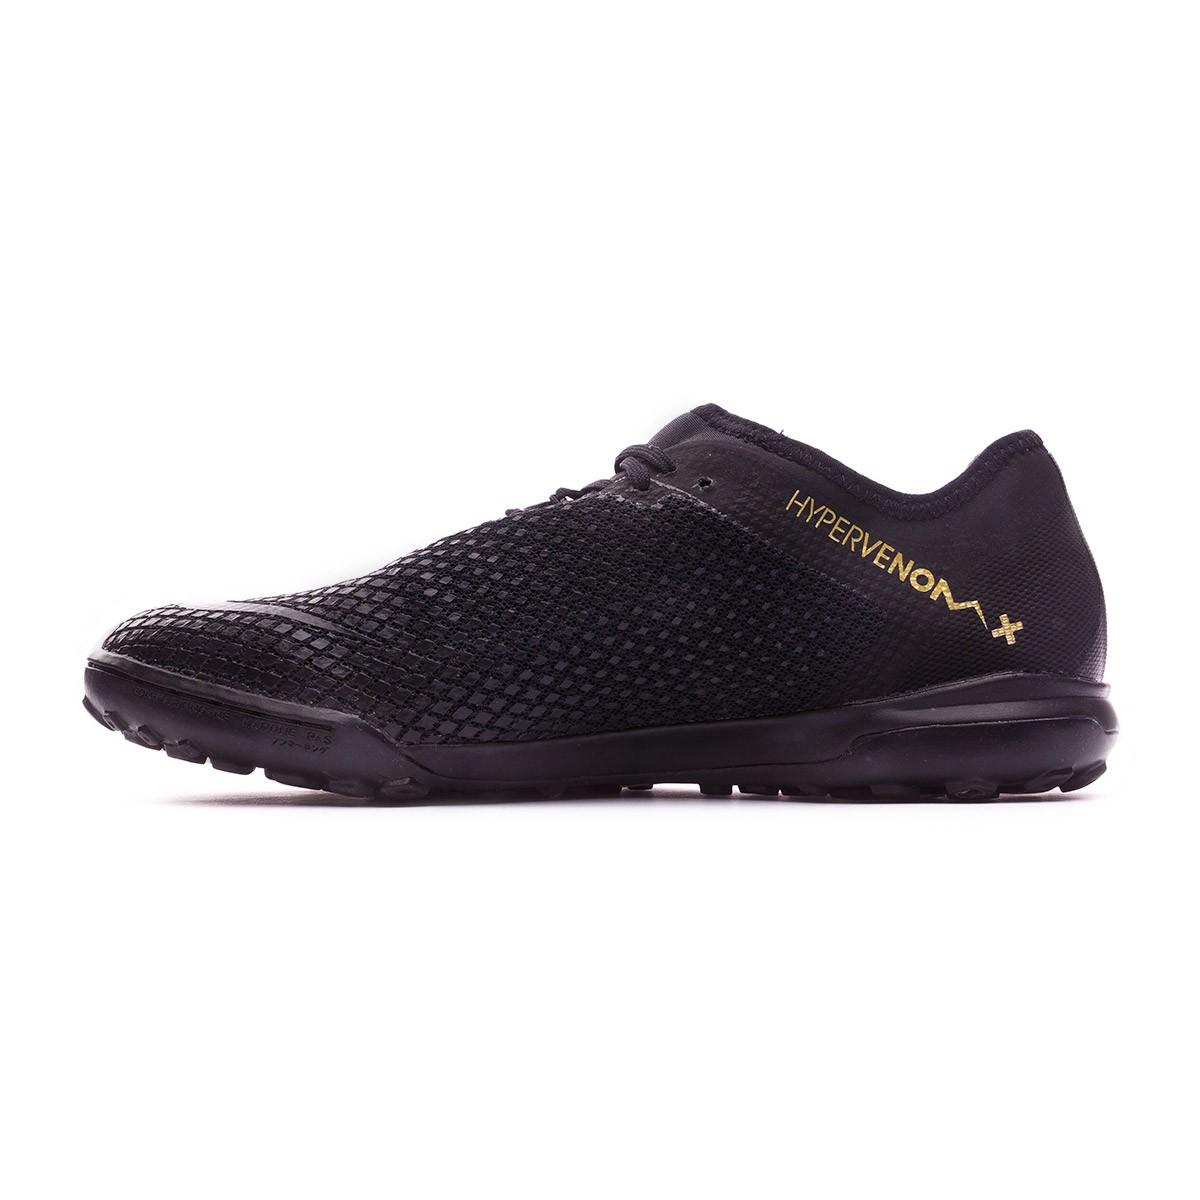 eea73a2577ff Tenis Nike Hypervenom Zoom PhantomX III Pro Turf Black-Metallic vivid gold  - Tienda de fútbol Fútbol Emotion